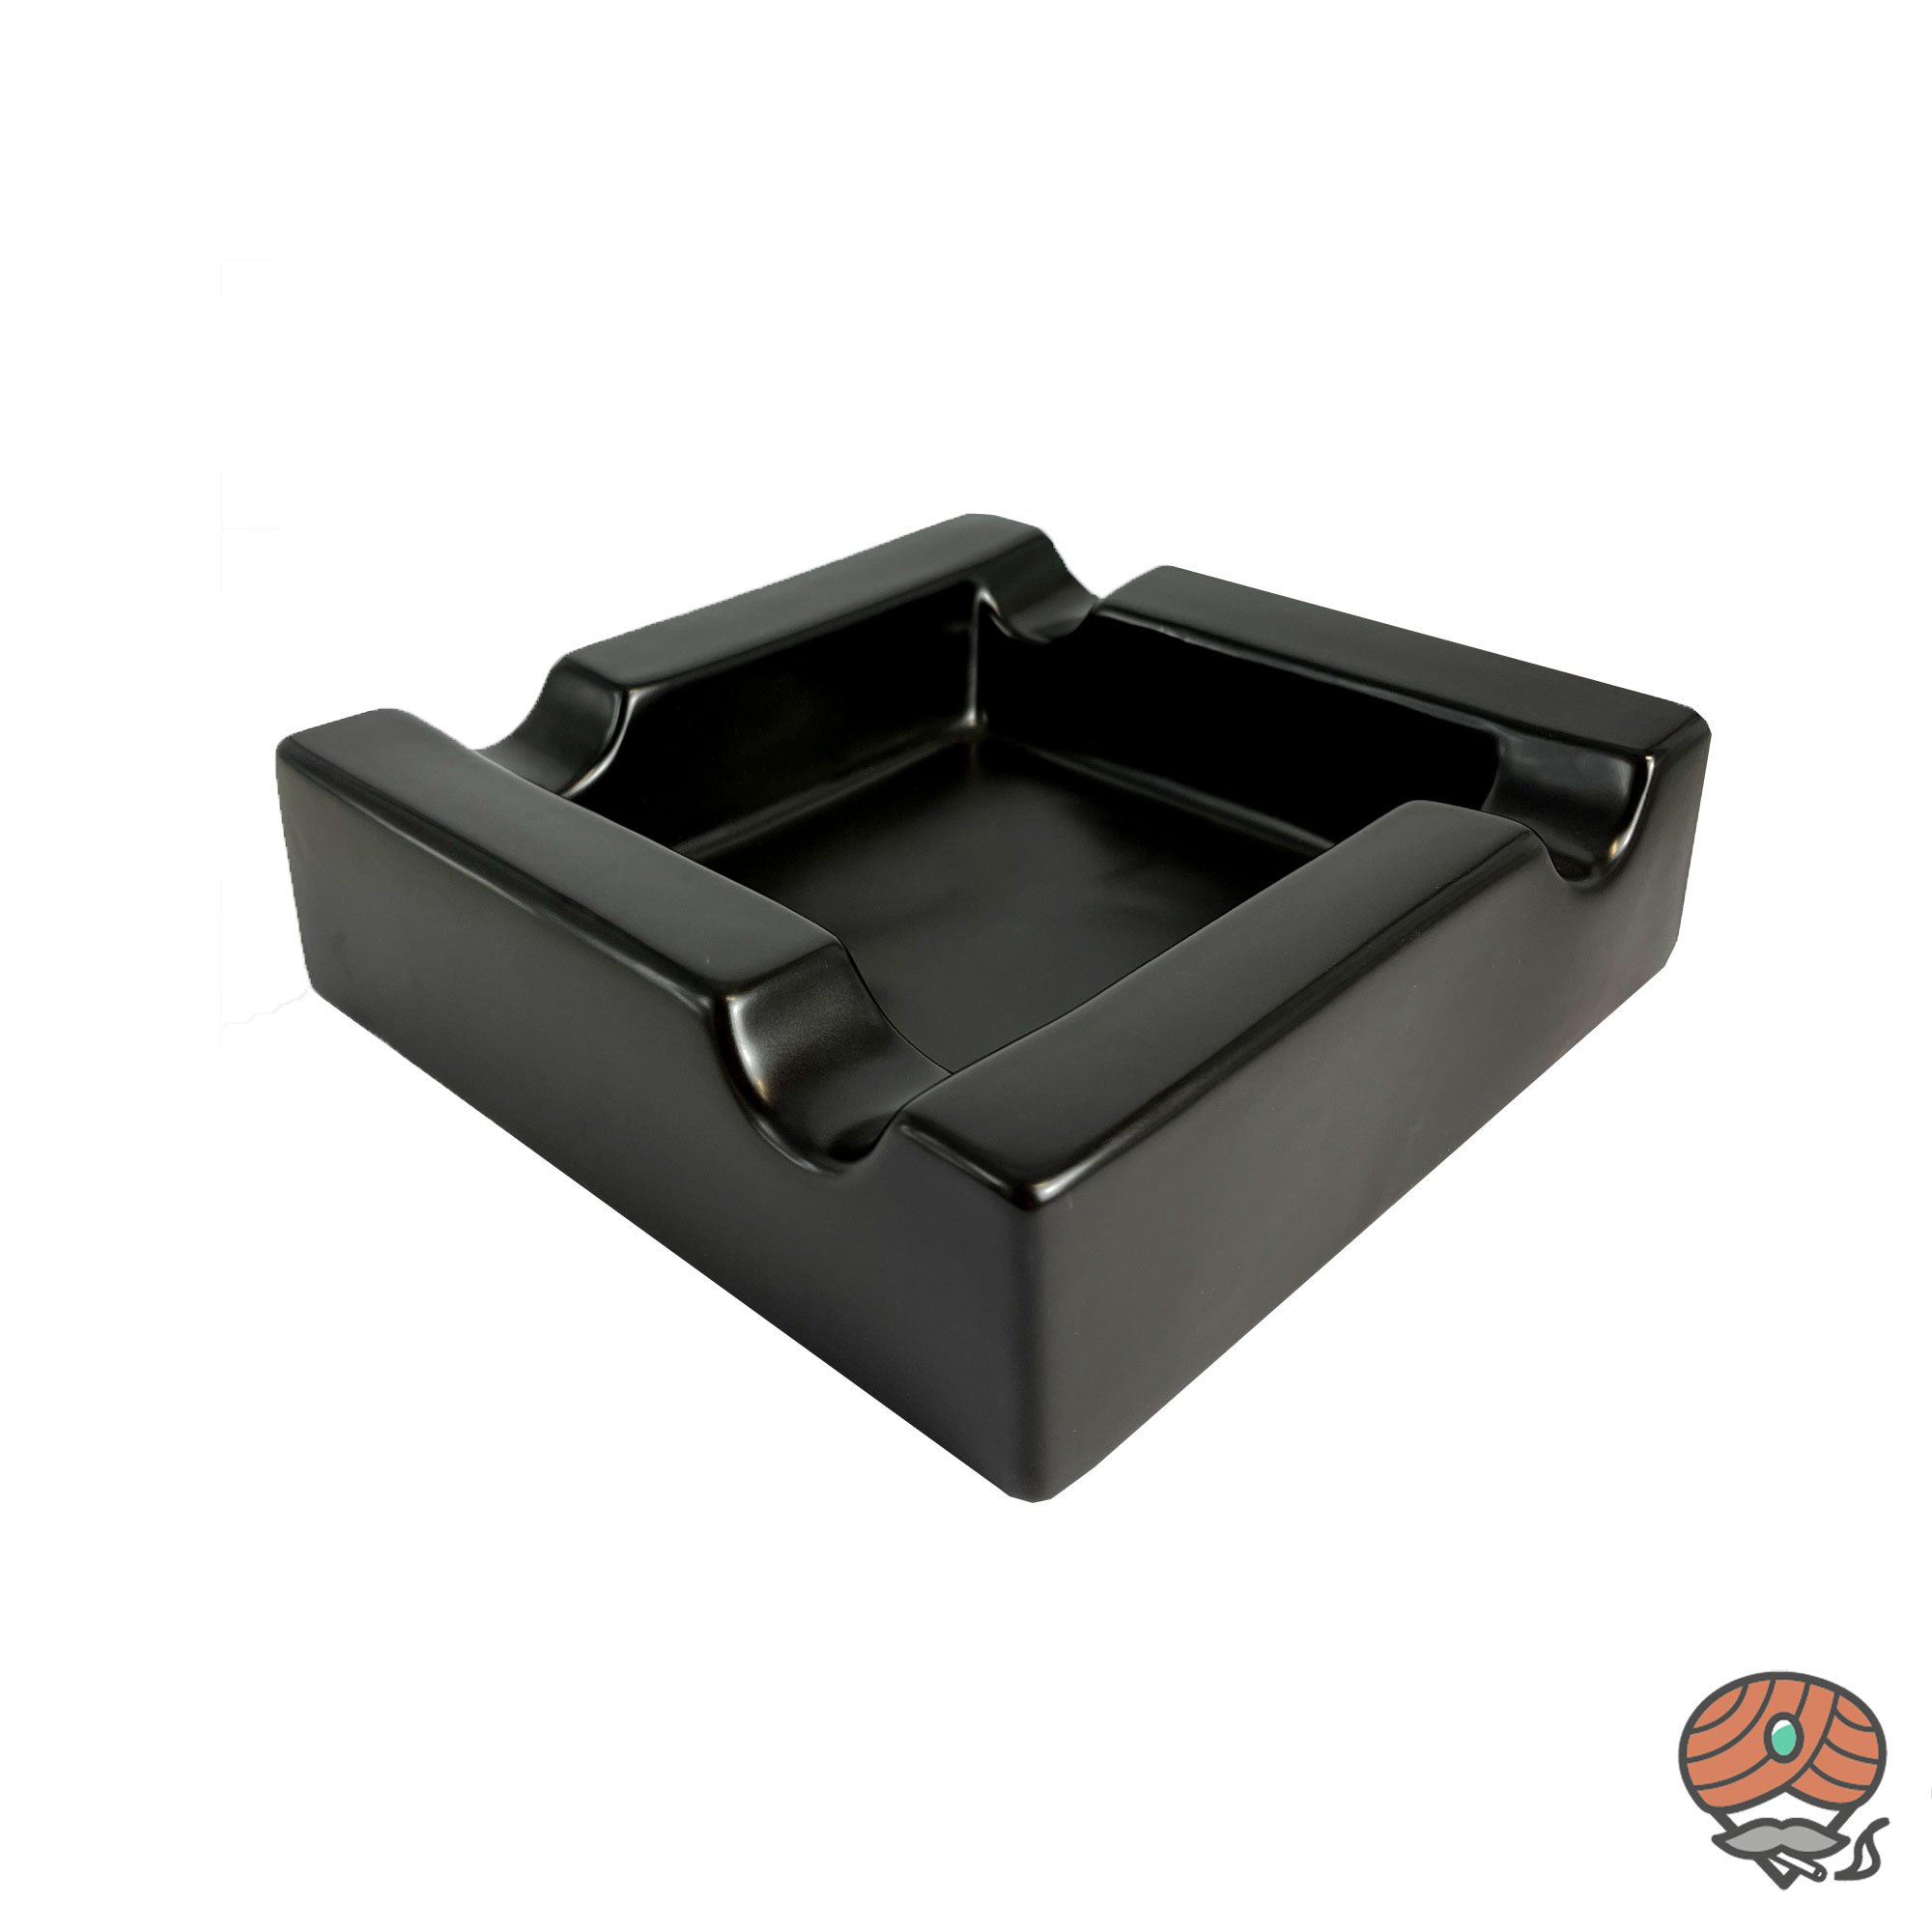 Angelo Keramik Zigarrenaschenbecher schwarz für 4 Zigarren